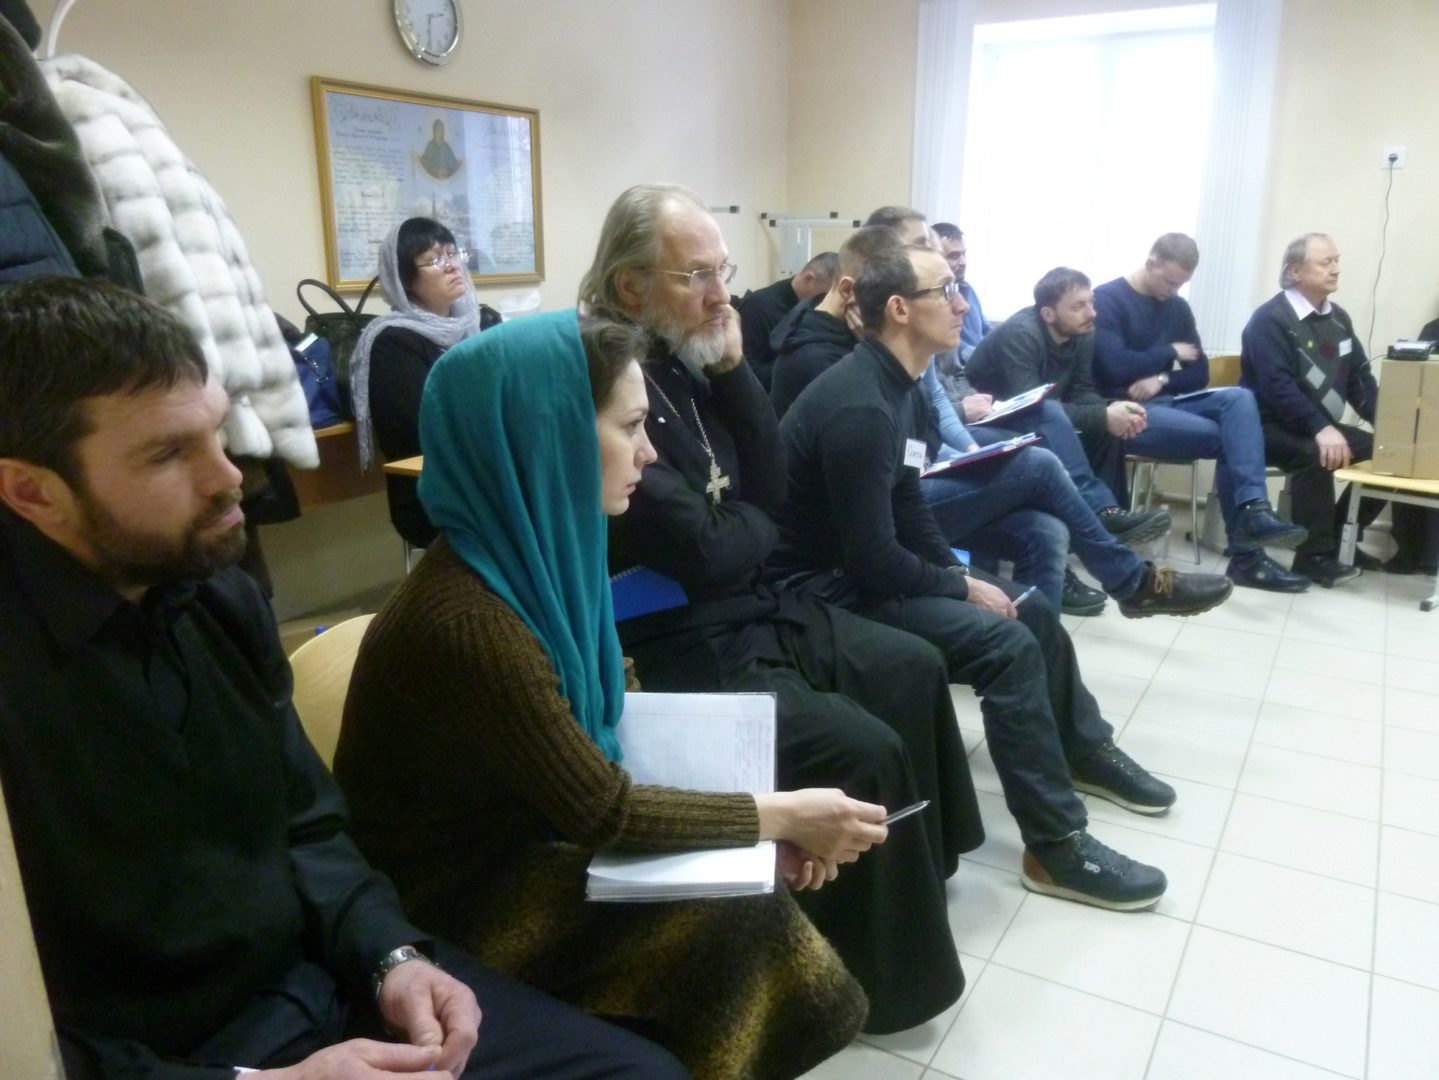 Центр реабилитации наркозависимых инициатива лечение алкоголизма по методу дар